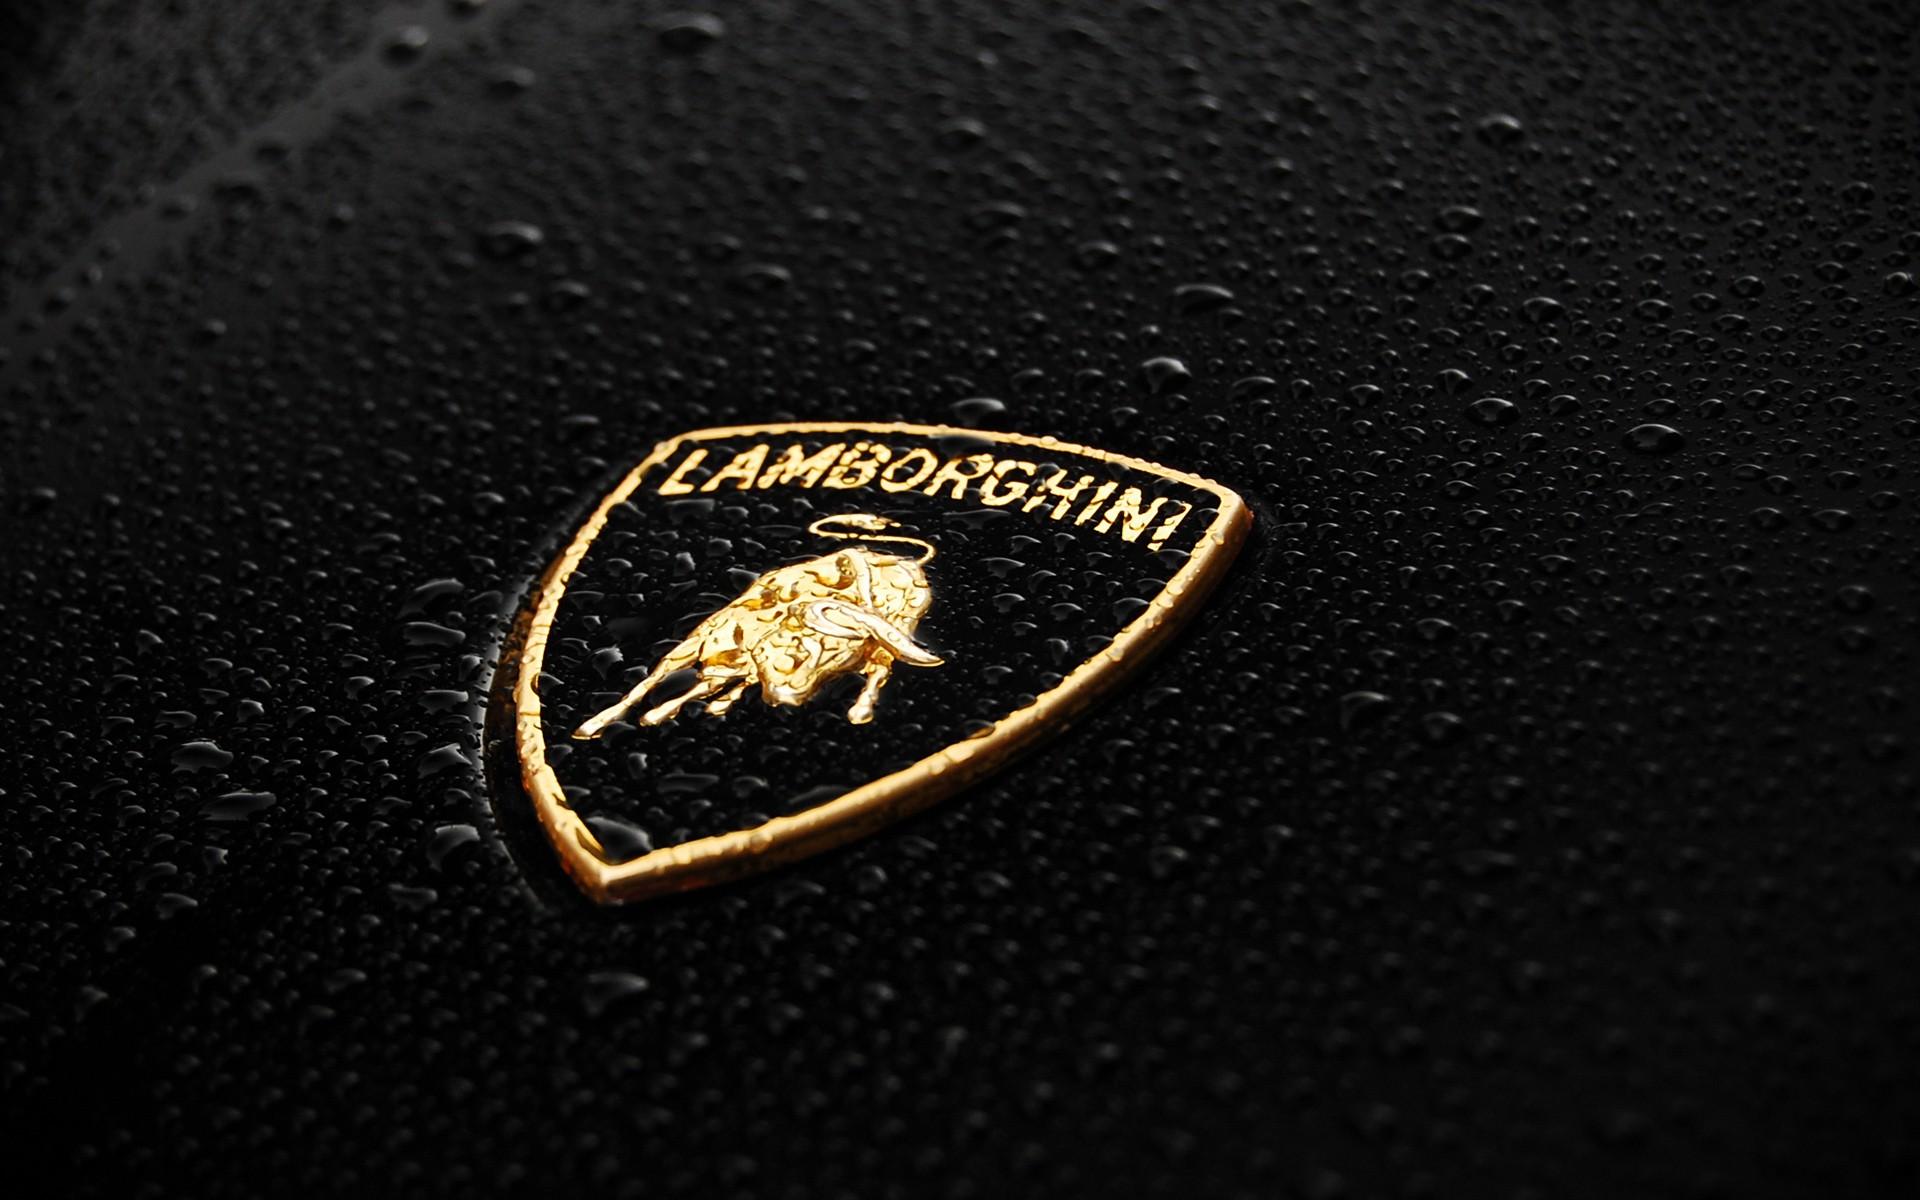 Pagani Car Wallpaper Lamborghini Logo Wallpaper Hd Car Wallpapers Id 2985